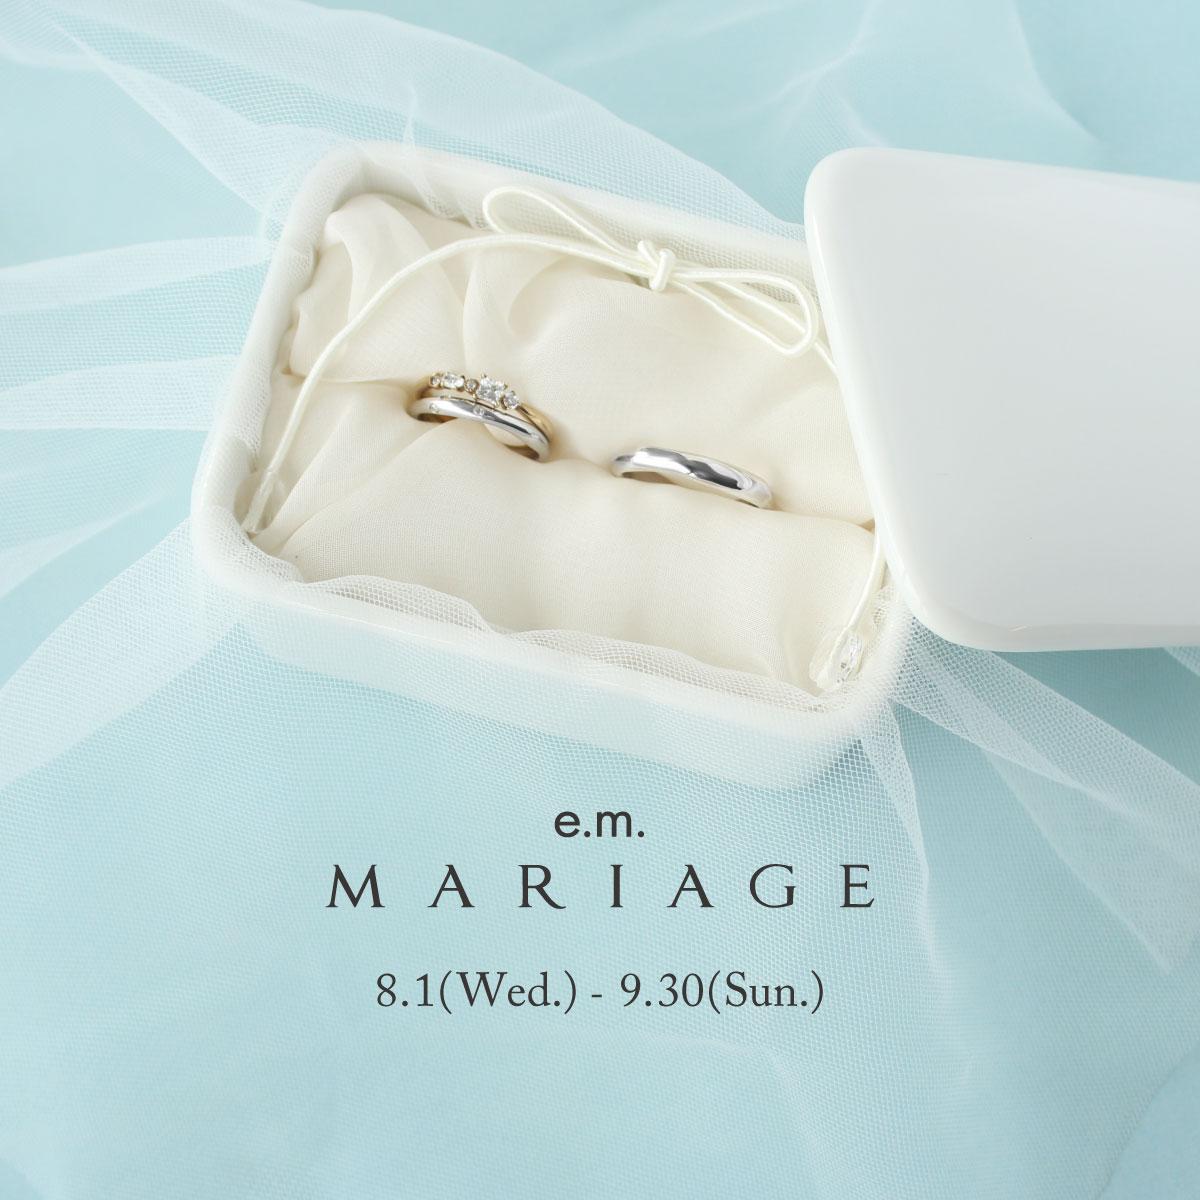 e.m.MARIAGE_bridalfair_ringpillow